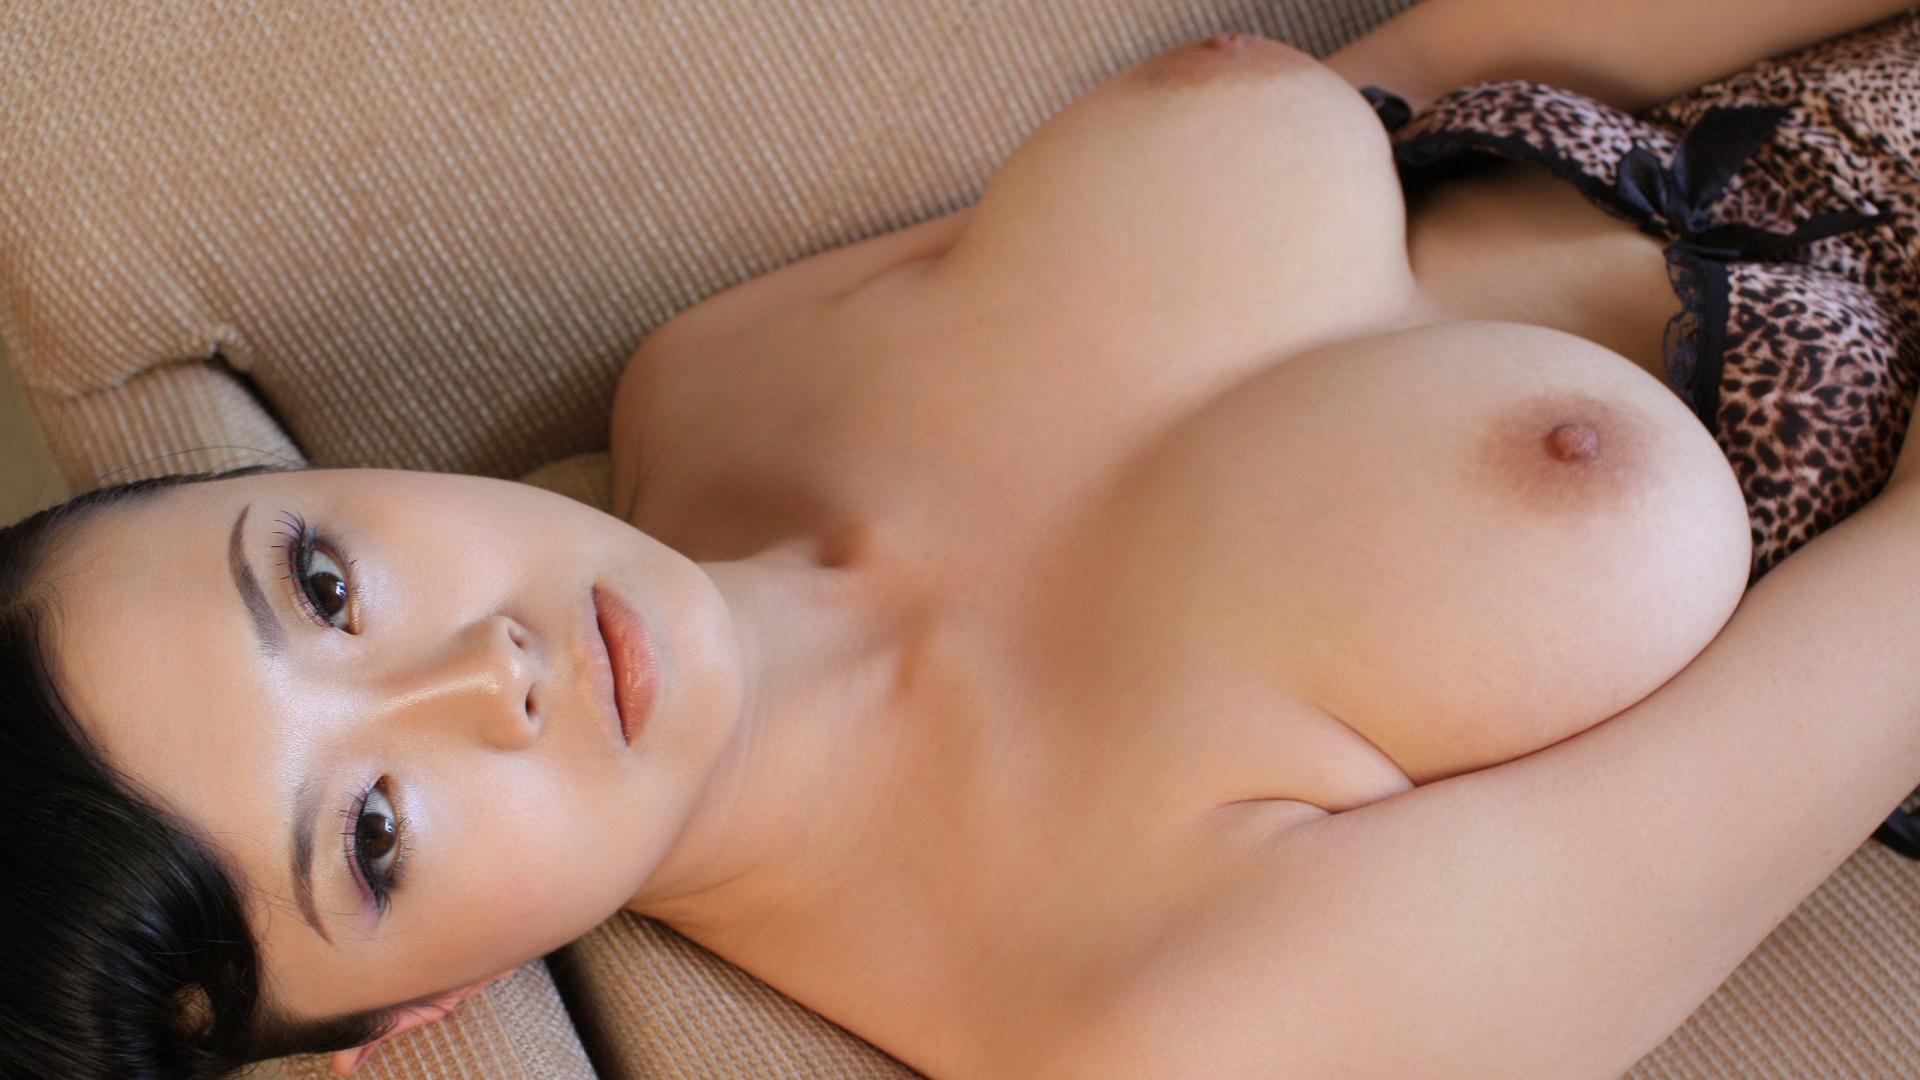 видов бетонных корейанка голийе картинки необходимо